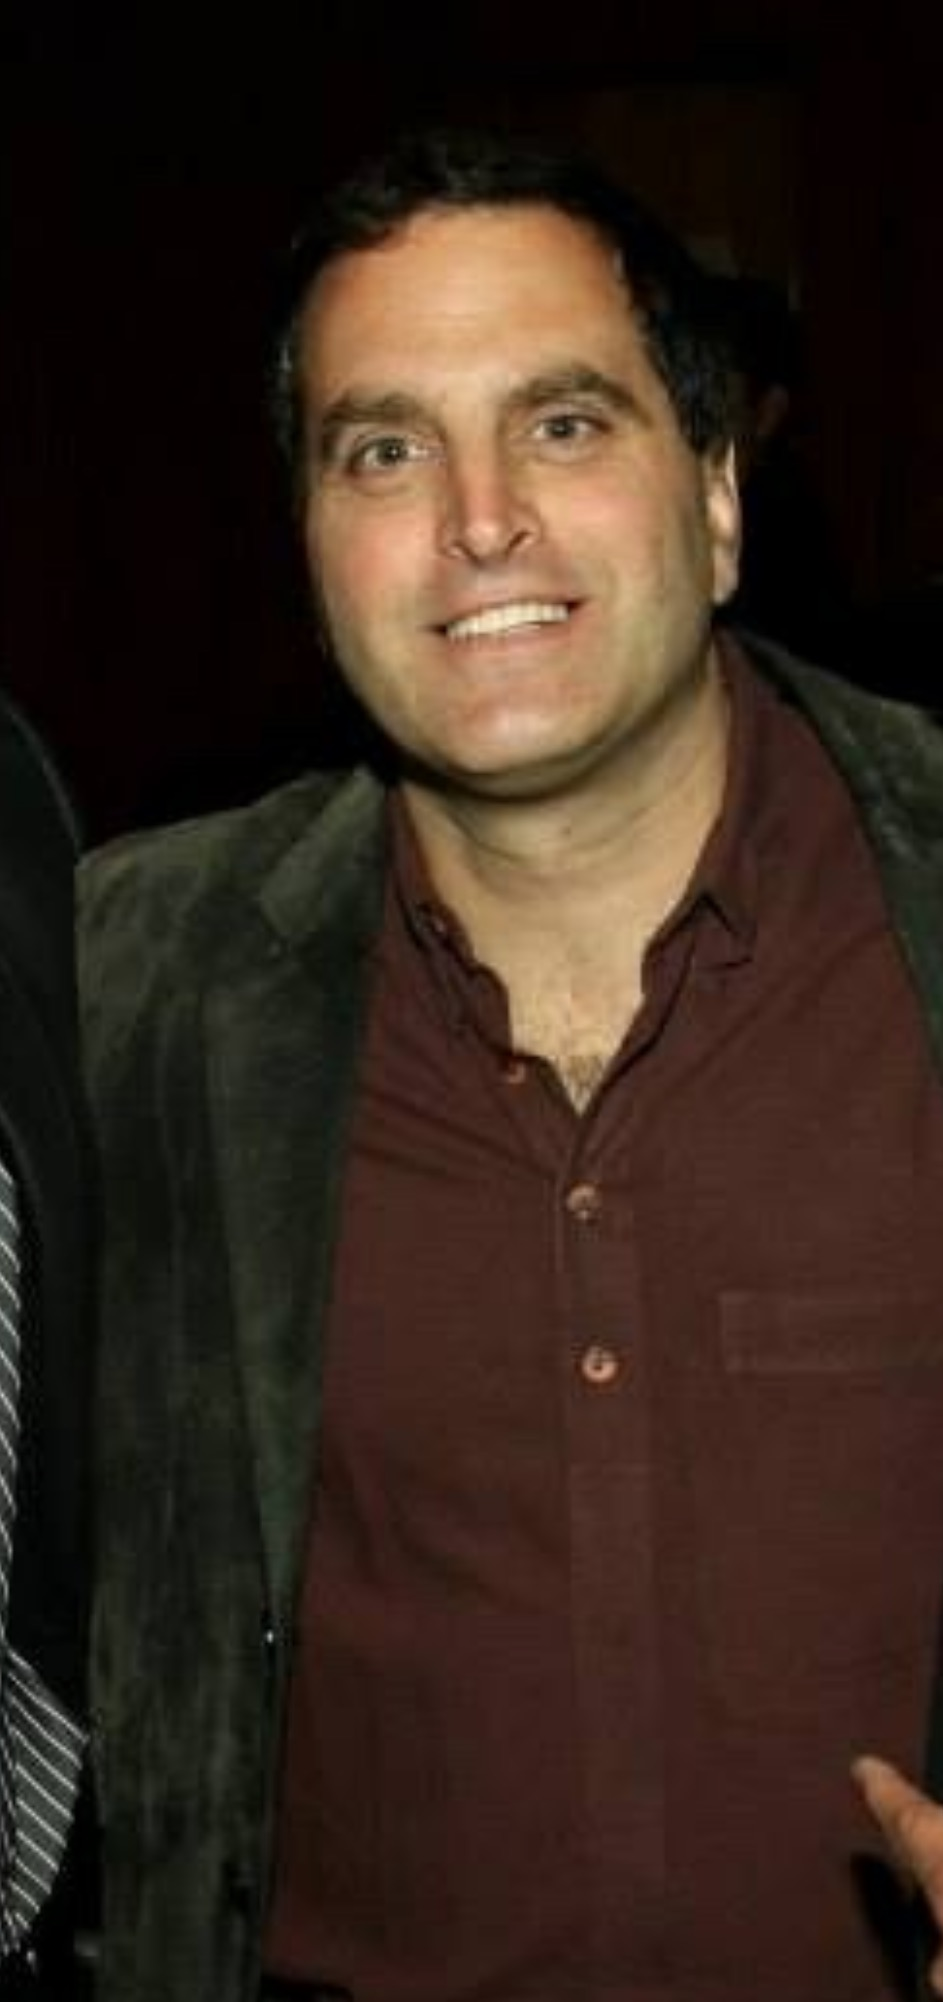 William Levine Podiatrist